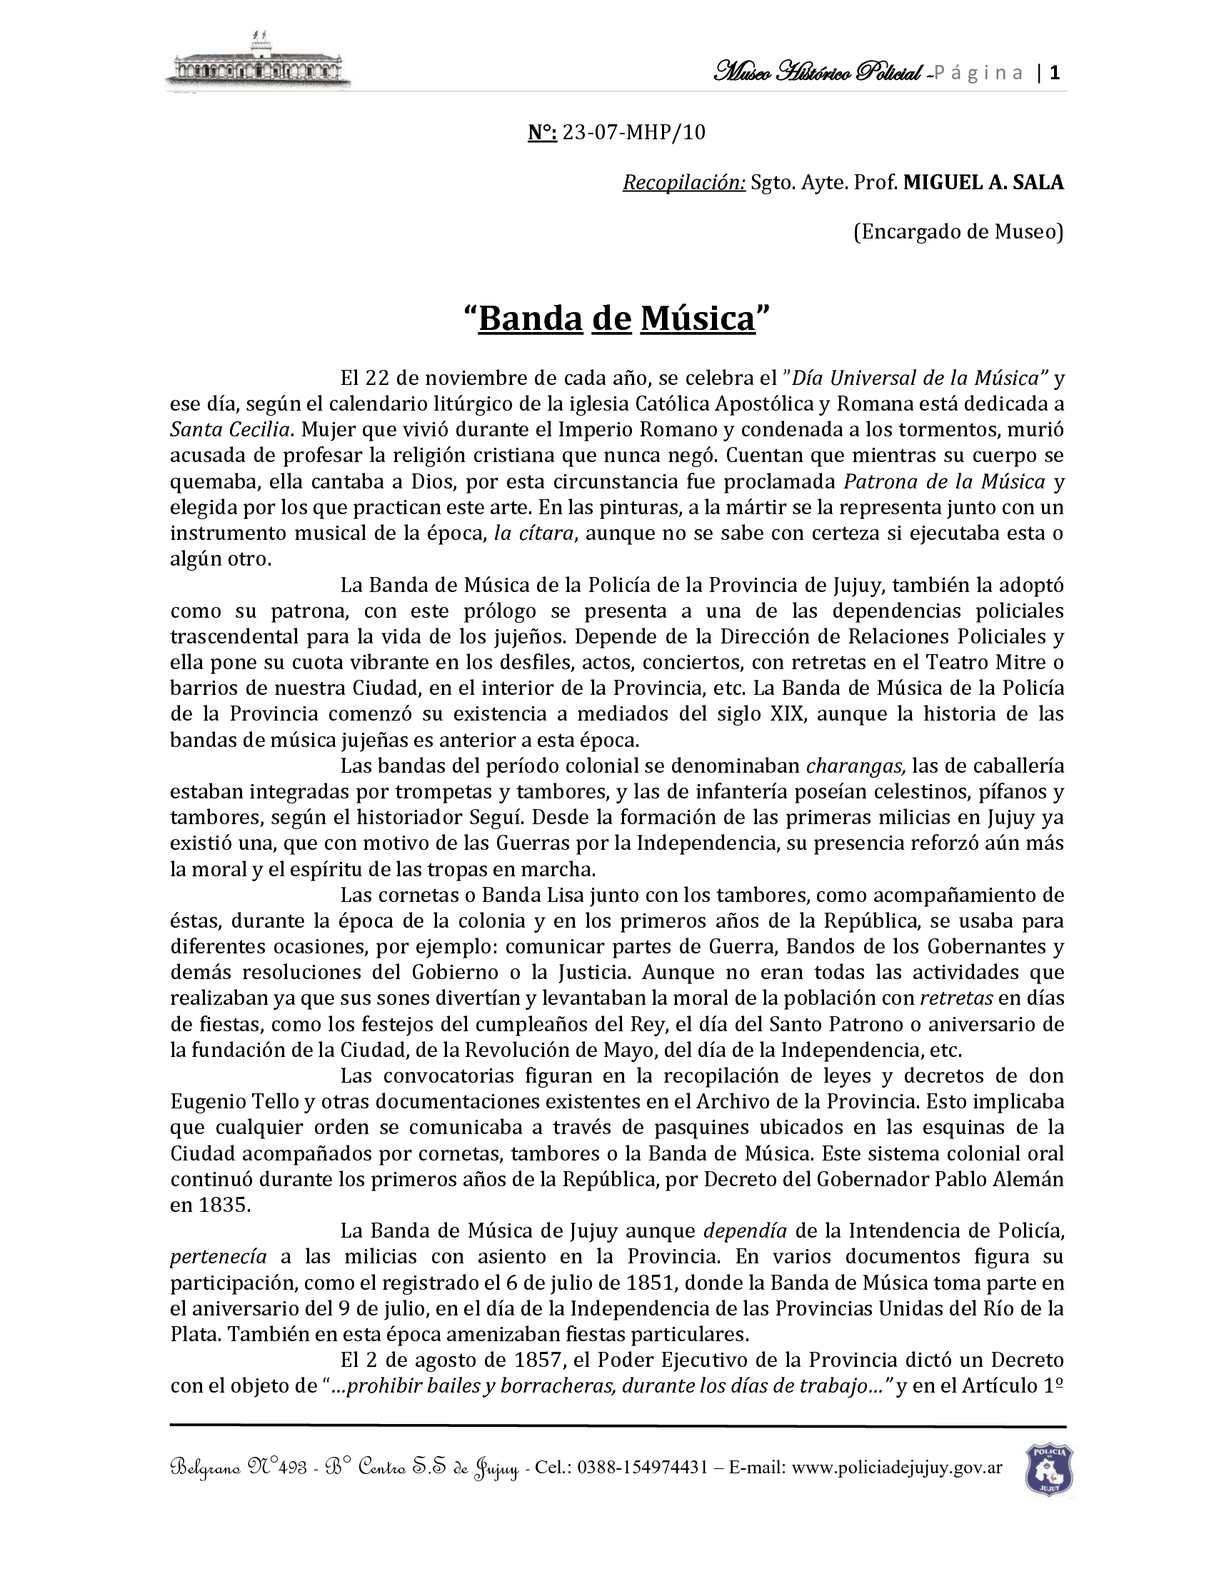 Banda de Musica - Policia de jujuy